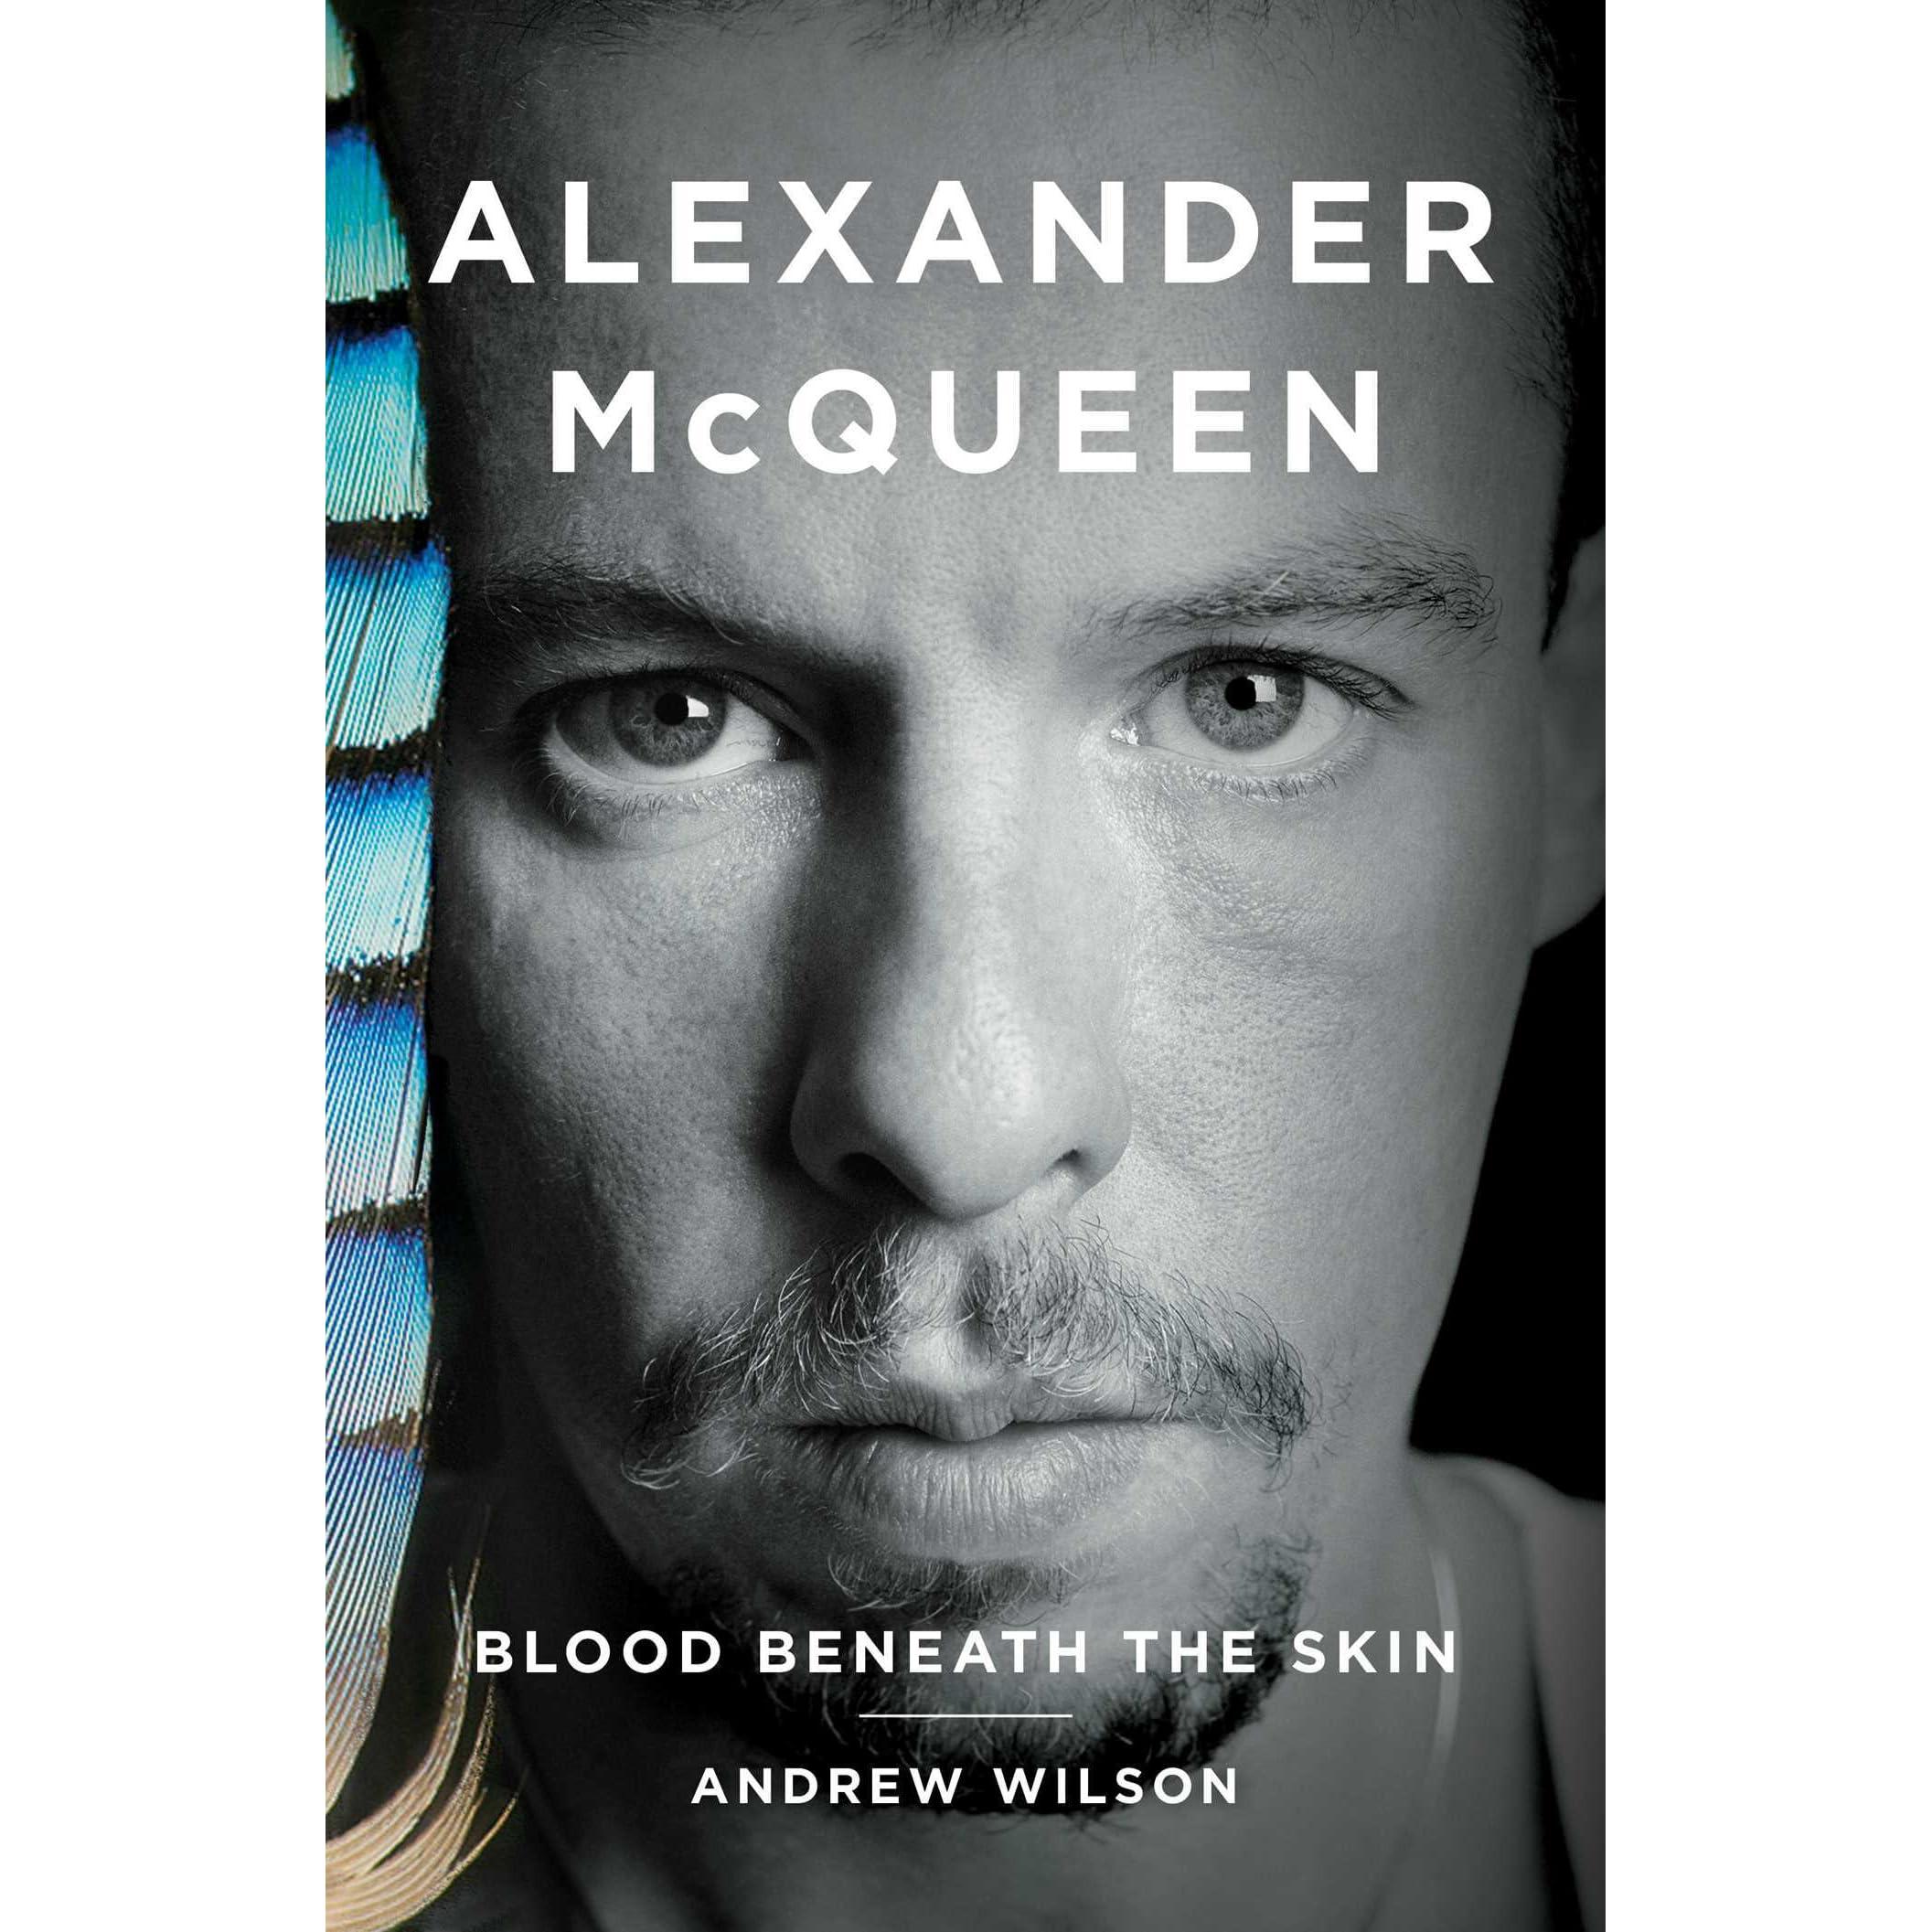 18905da7345ae Alexander McQueen: Blood Beneath the Skin by Andrew Wilson